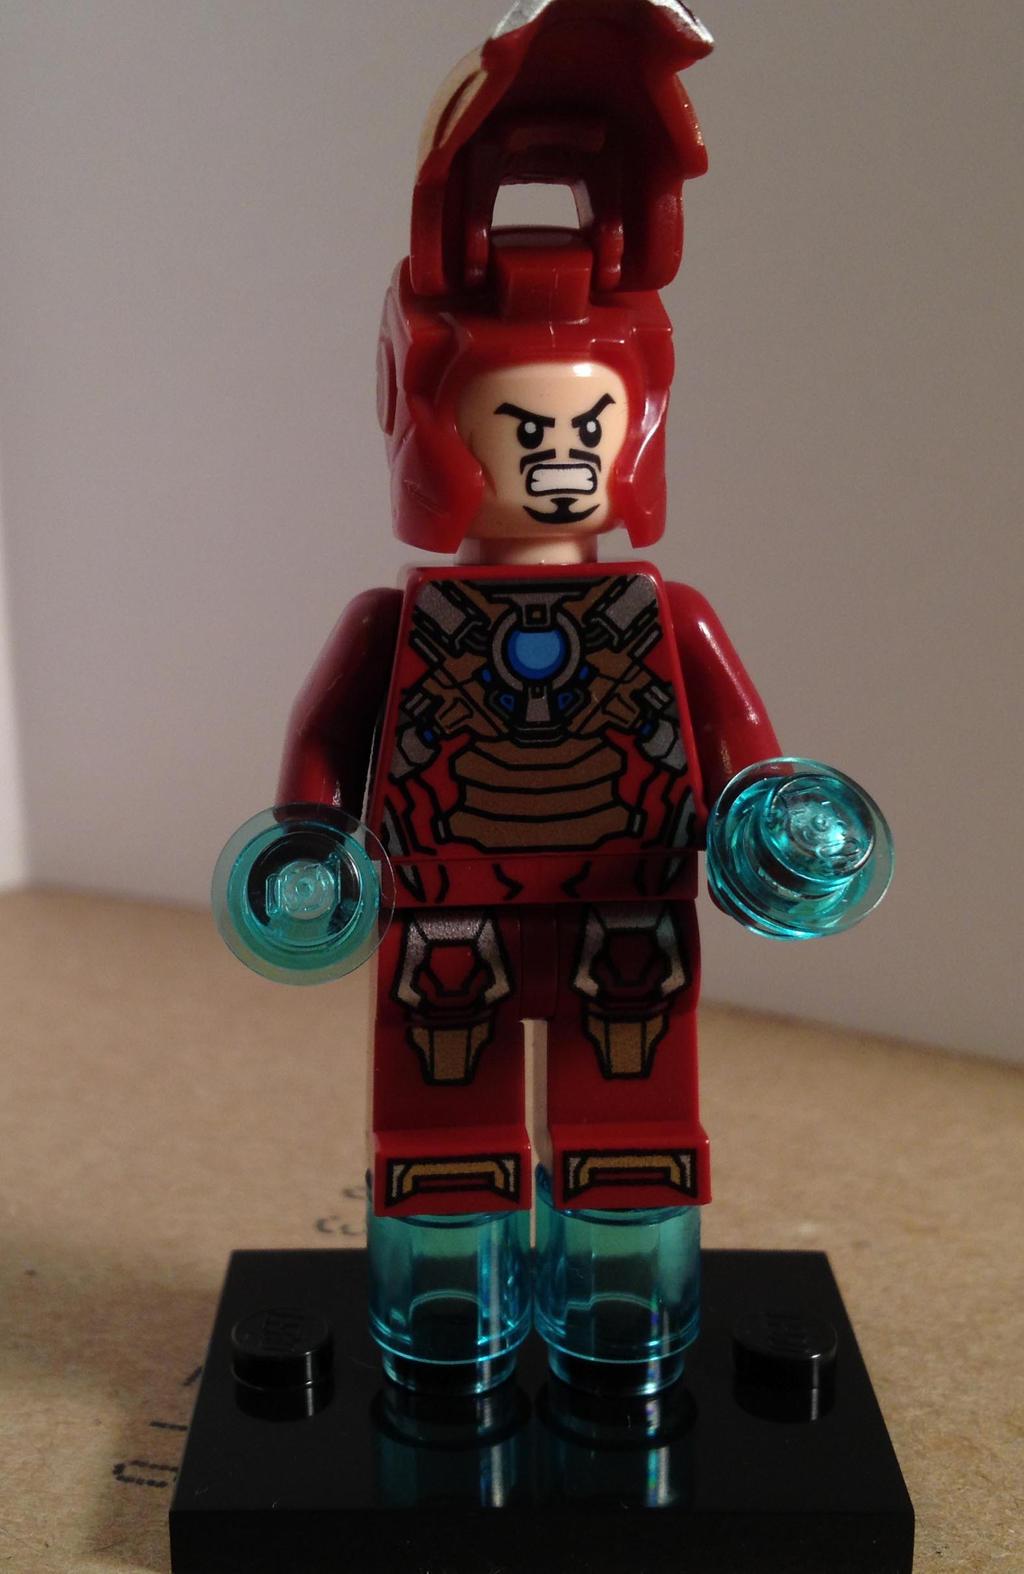 Iron Man Heartbreaker Armor Lego Minifigure by ...